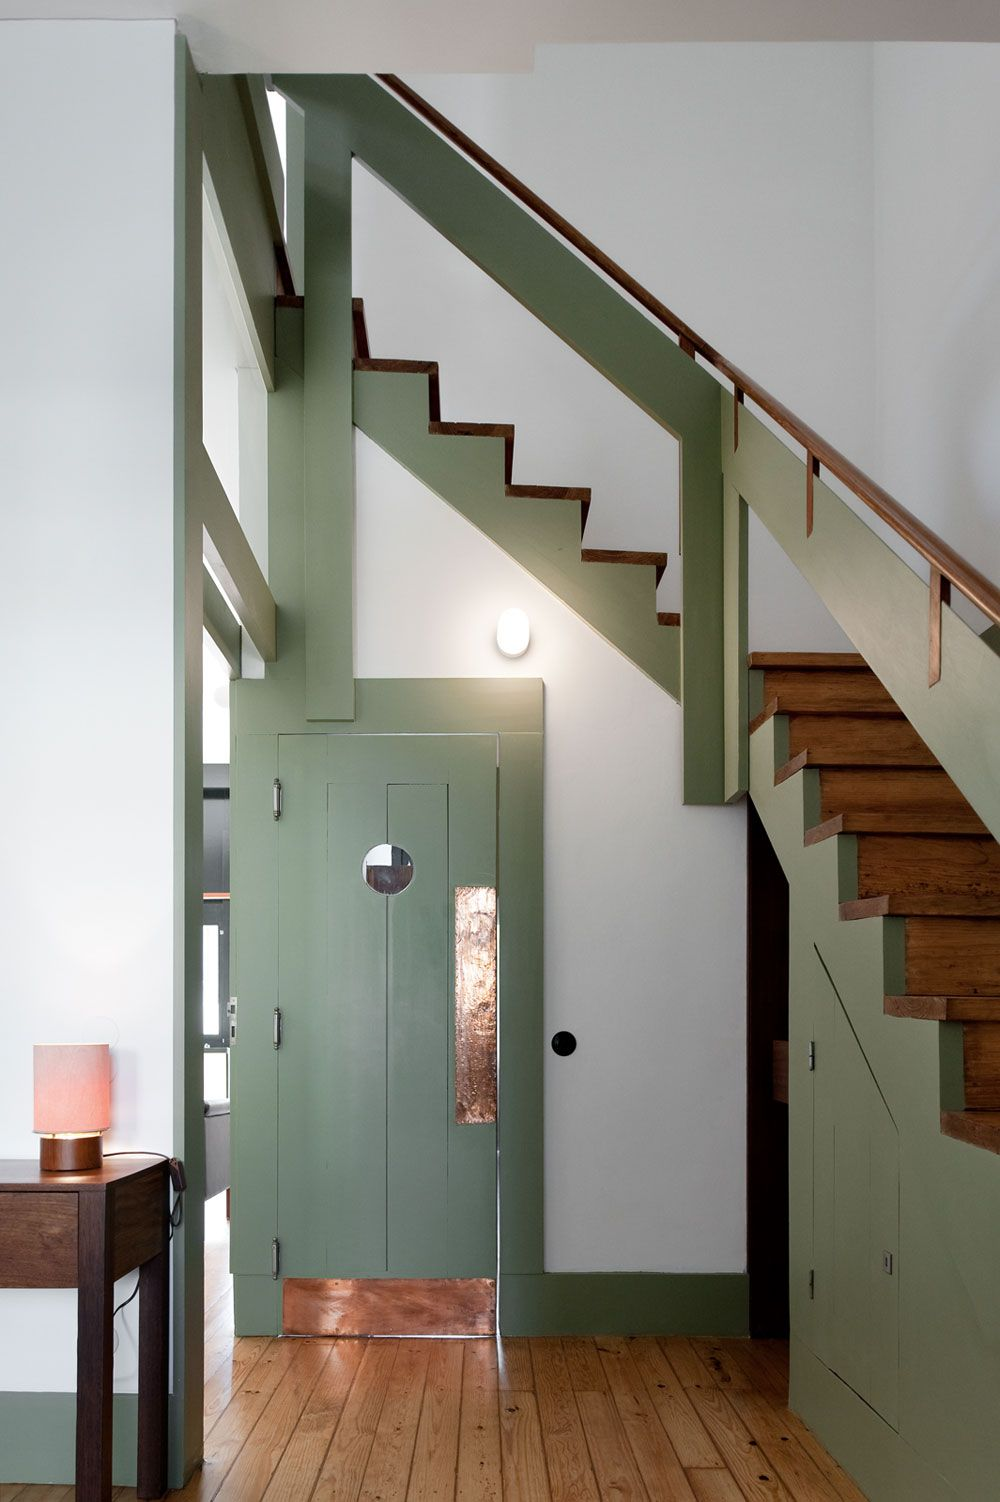 Casa em roberto ivens alvaro siza catalogo for Idee architettura interni